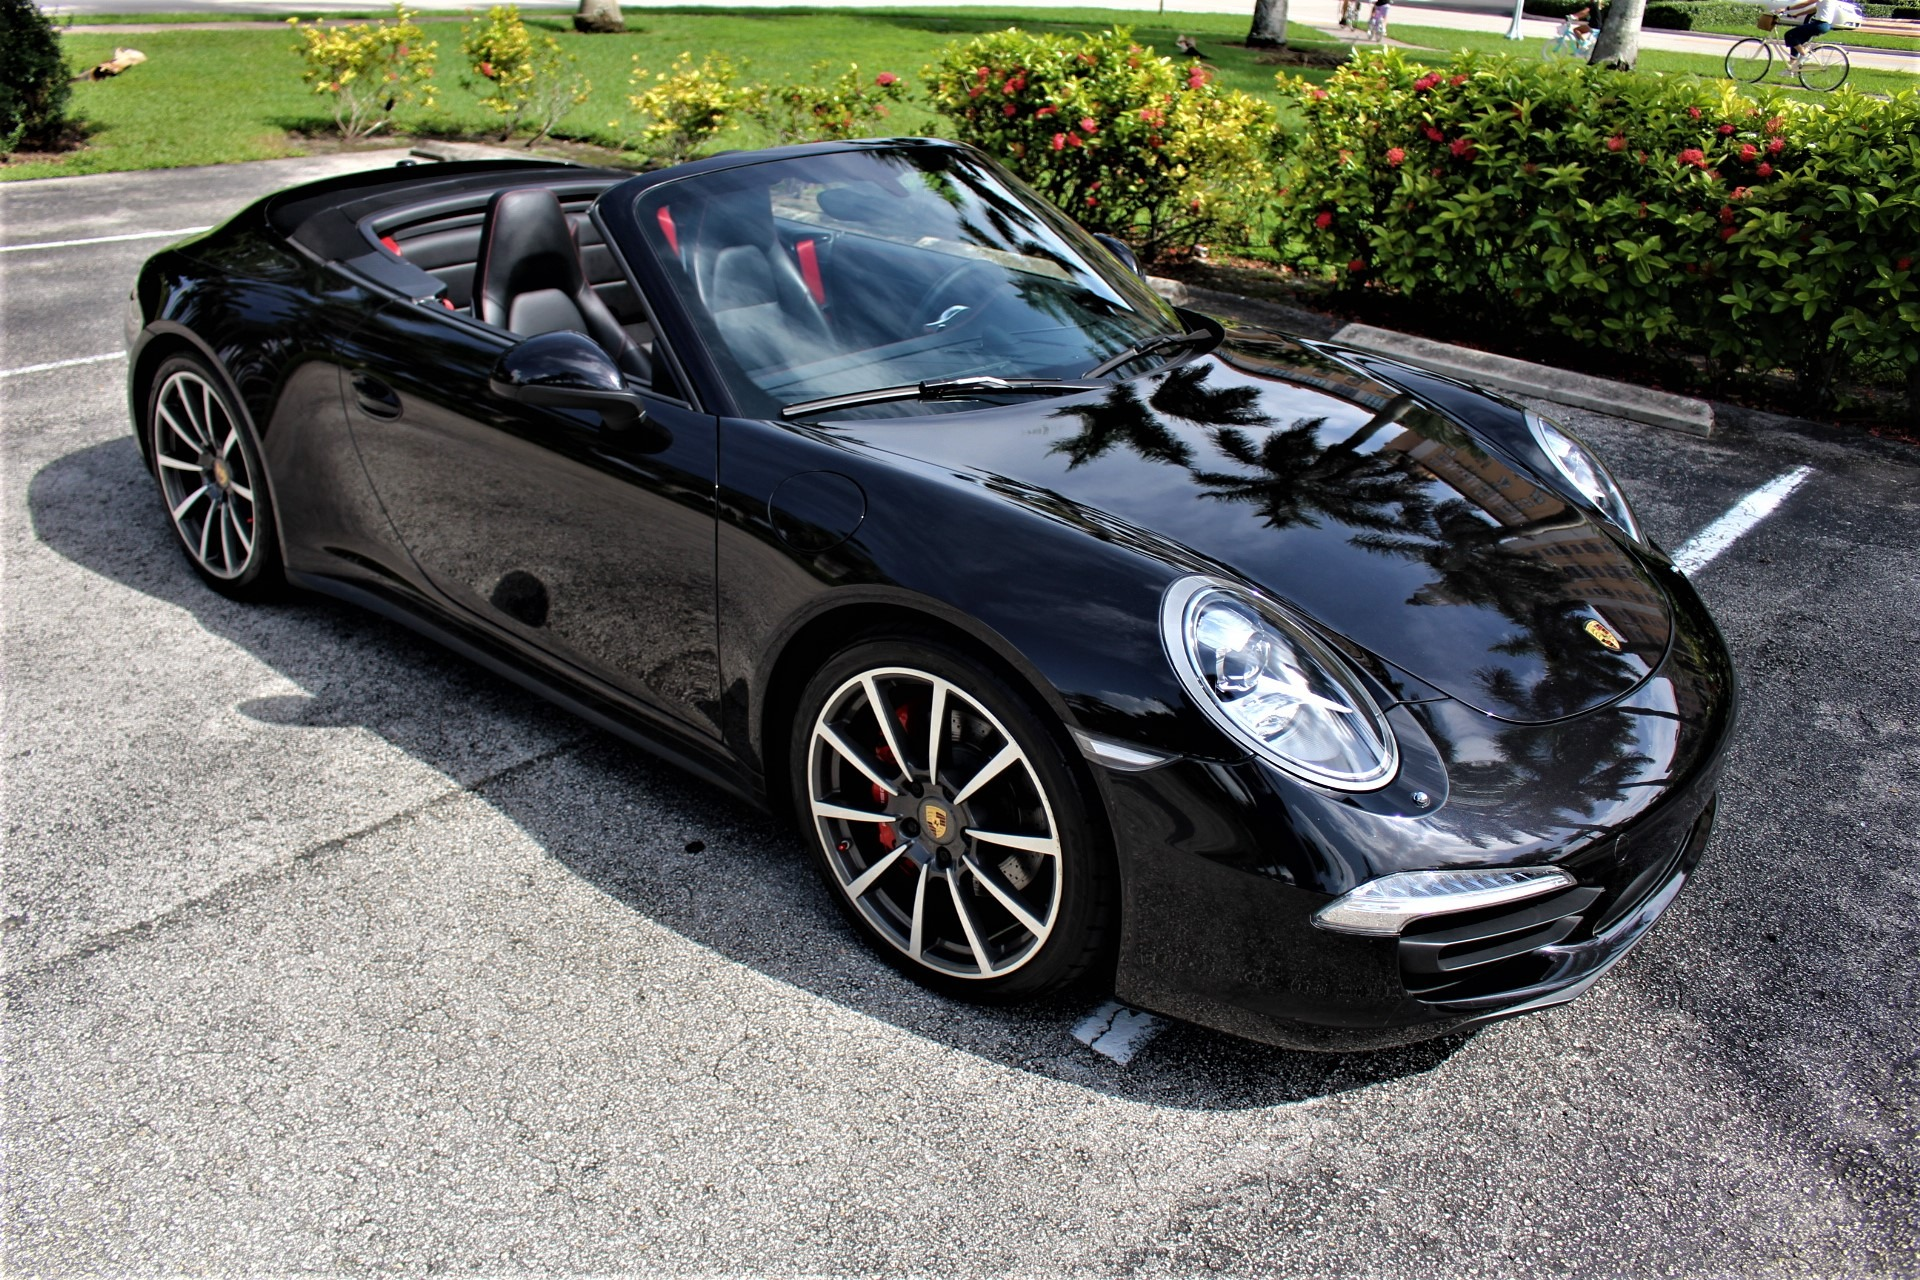 Used 2013 Porsche 911 Carrera 4S for sale $88,850 at The Gables Sports Cars in Miami FL 33146 3